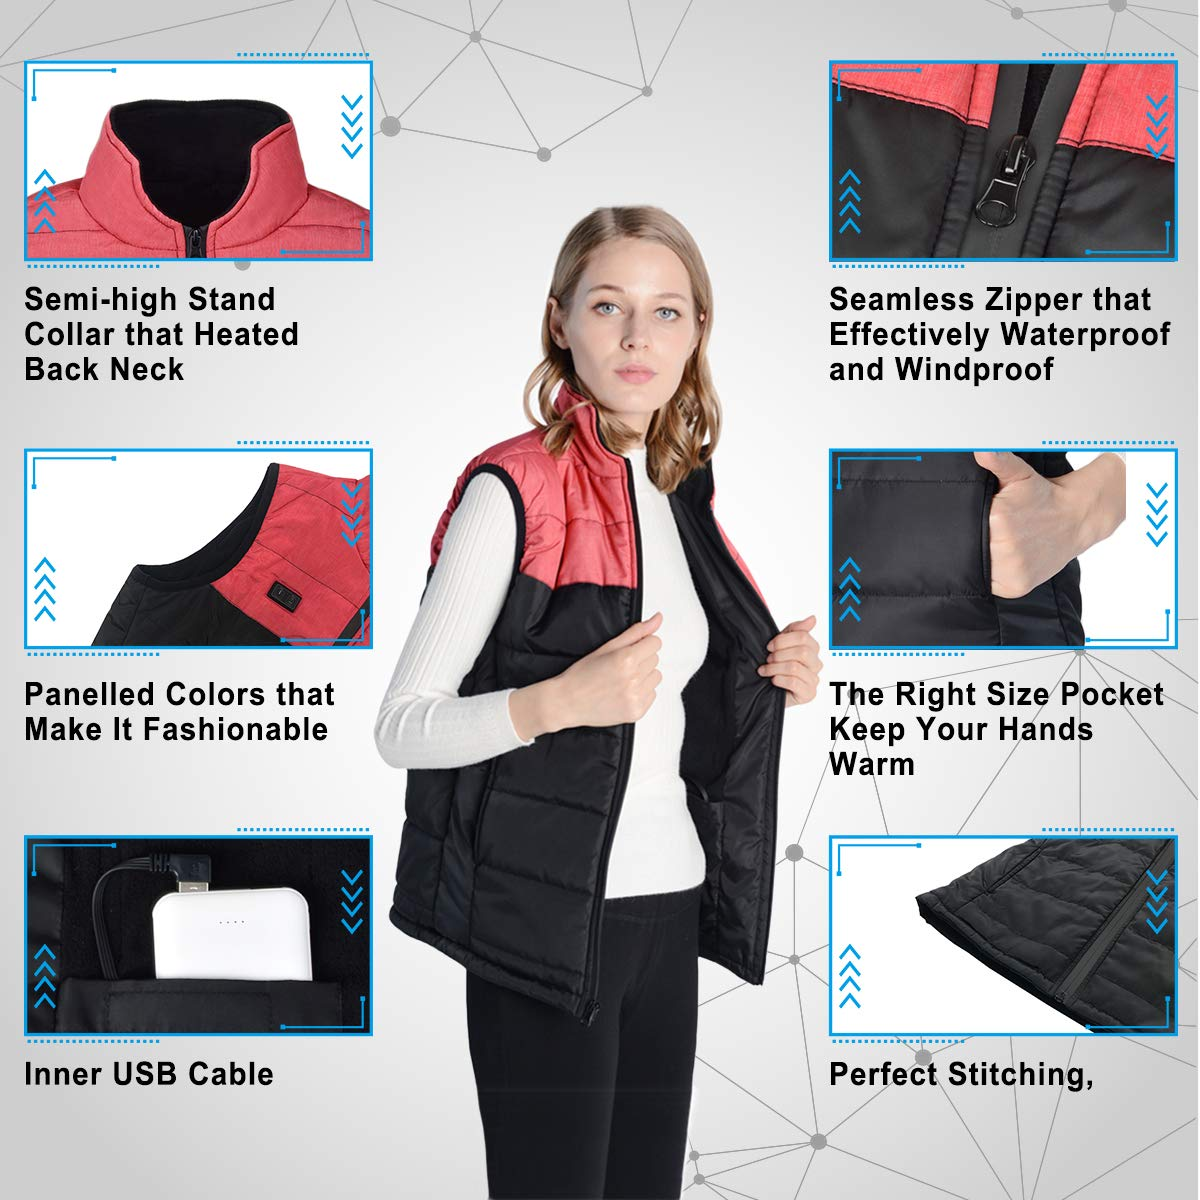 ZIIFULLHOU Womens Heated Vest Lightweight Thermal Jacket Sleeveless Heating Outdoor Coat